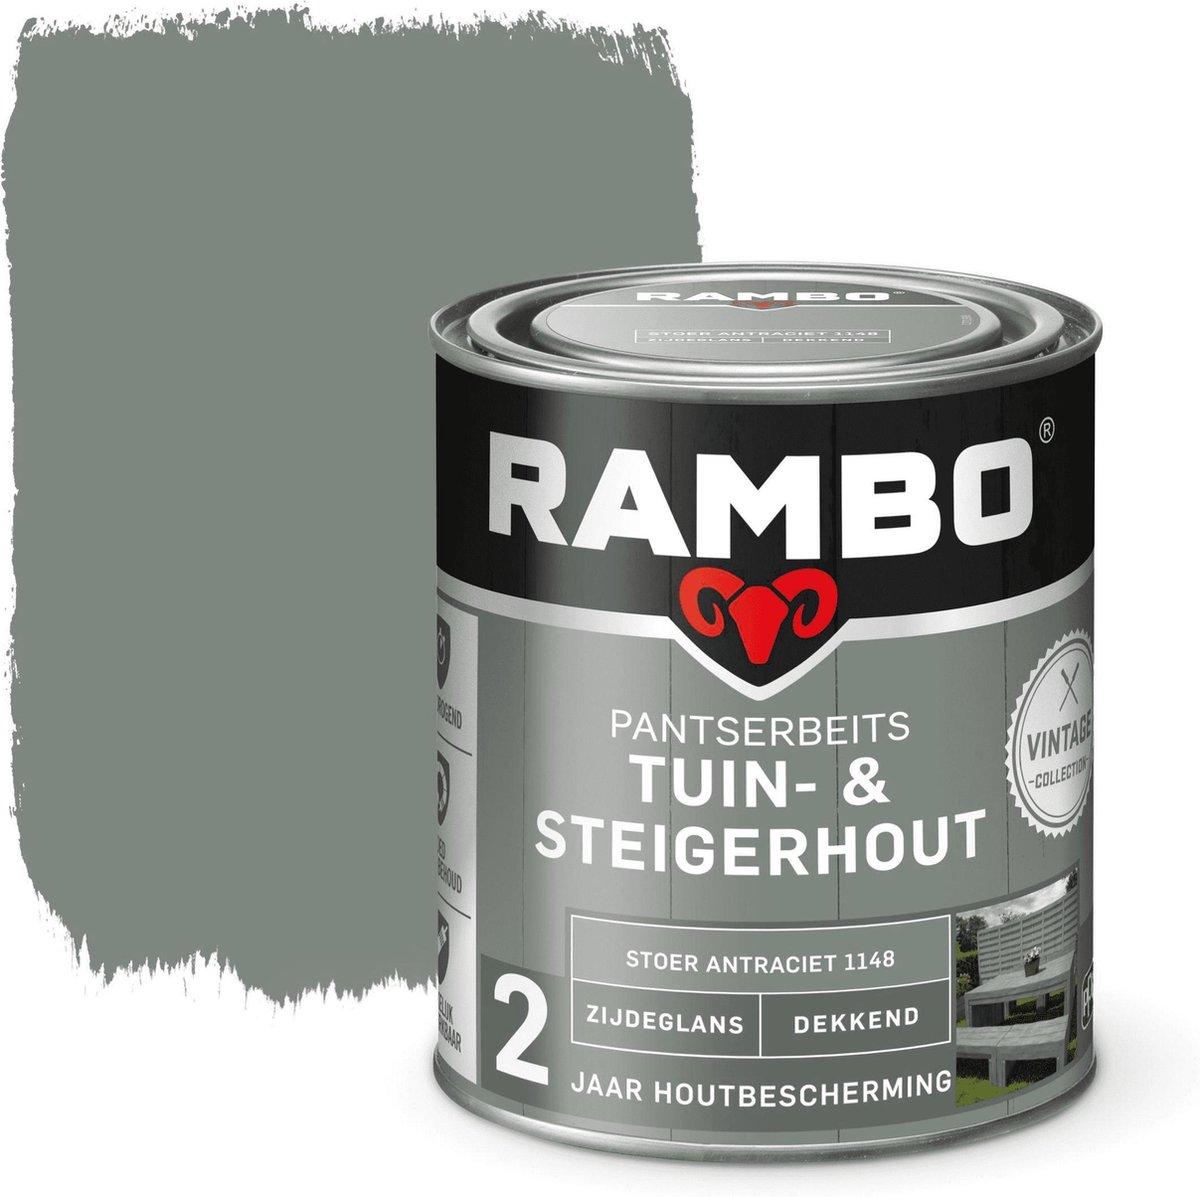 Tuin - & Steigerhout 750 ml Stoer Antraciet 1148